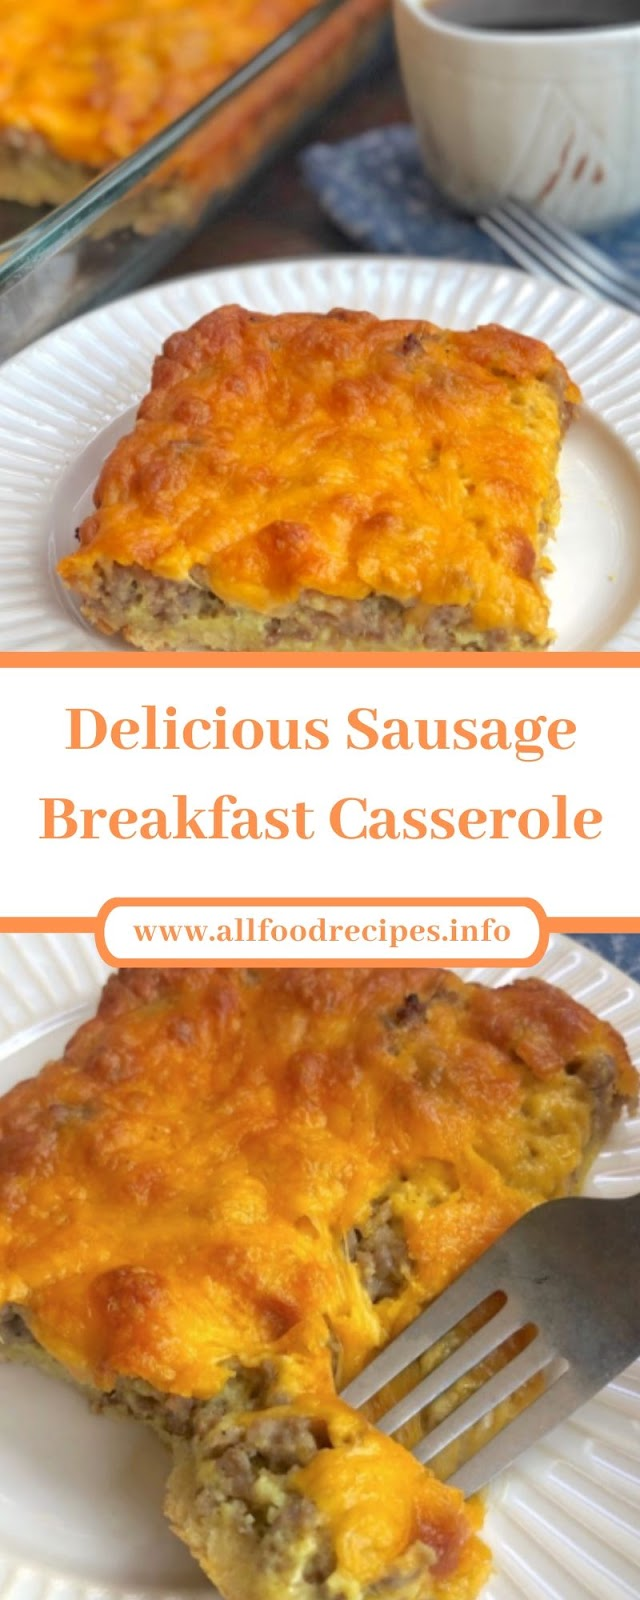 Delicious Sausage Breakfast Casserole